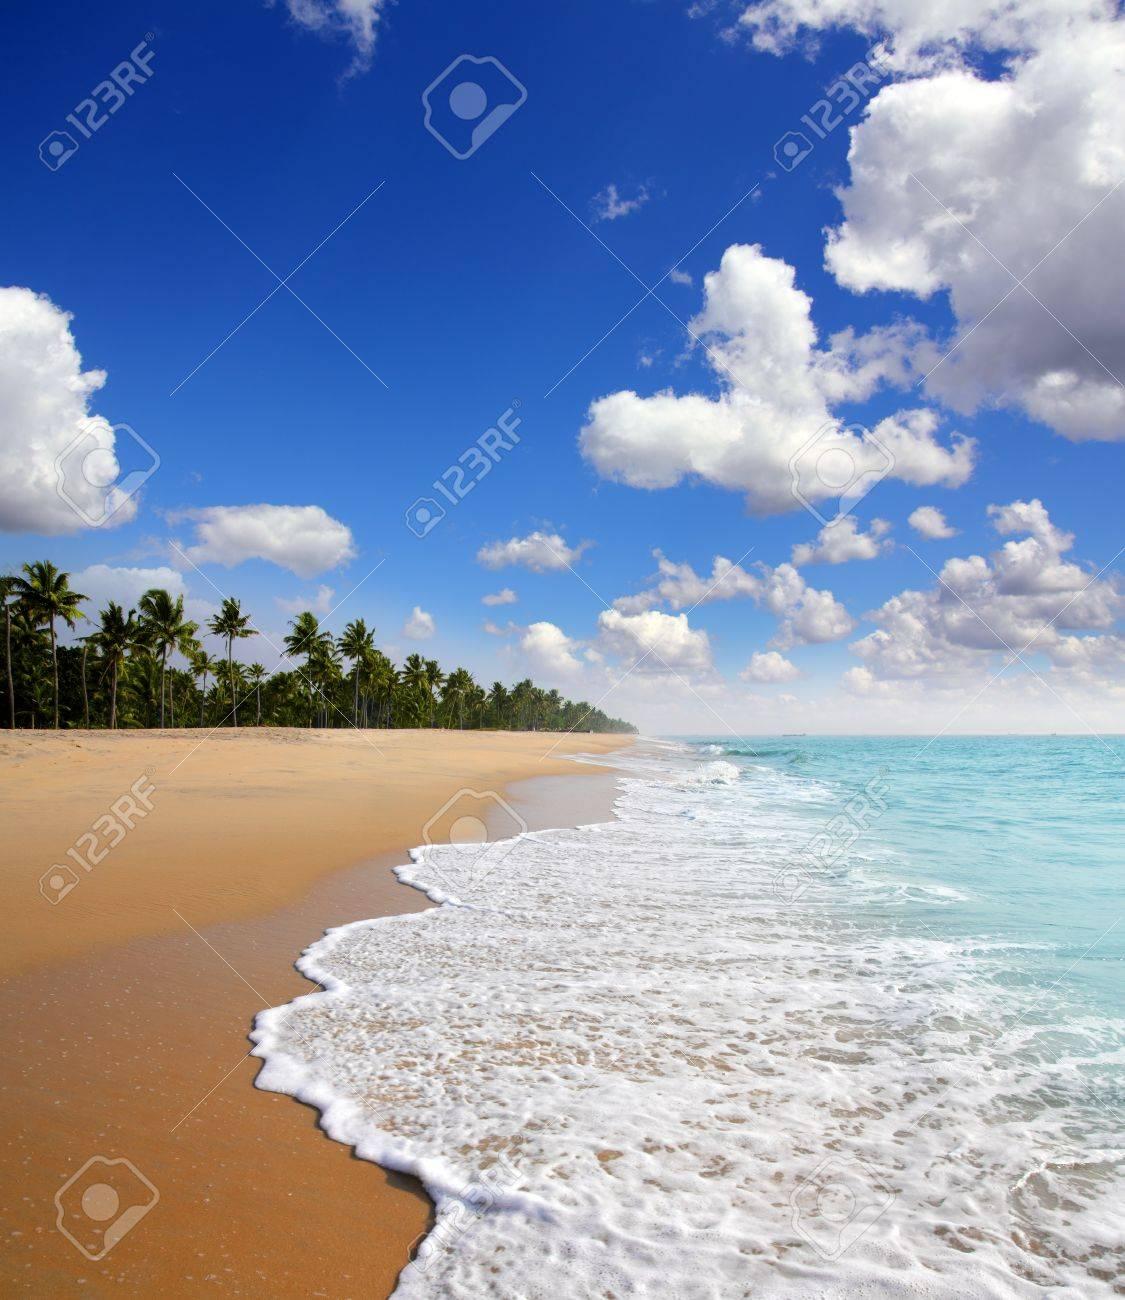 beautiful beach landscape - ocean in India - 18494752